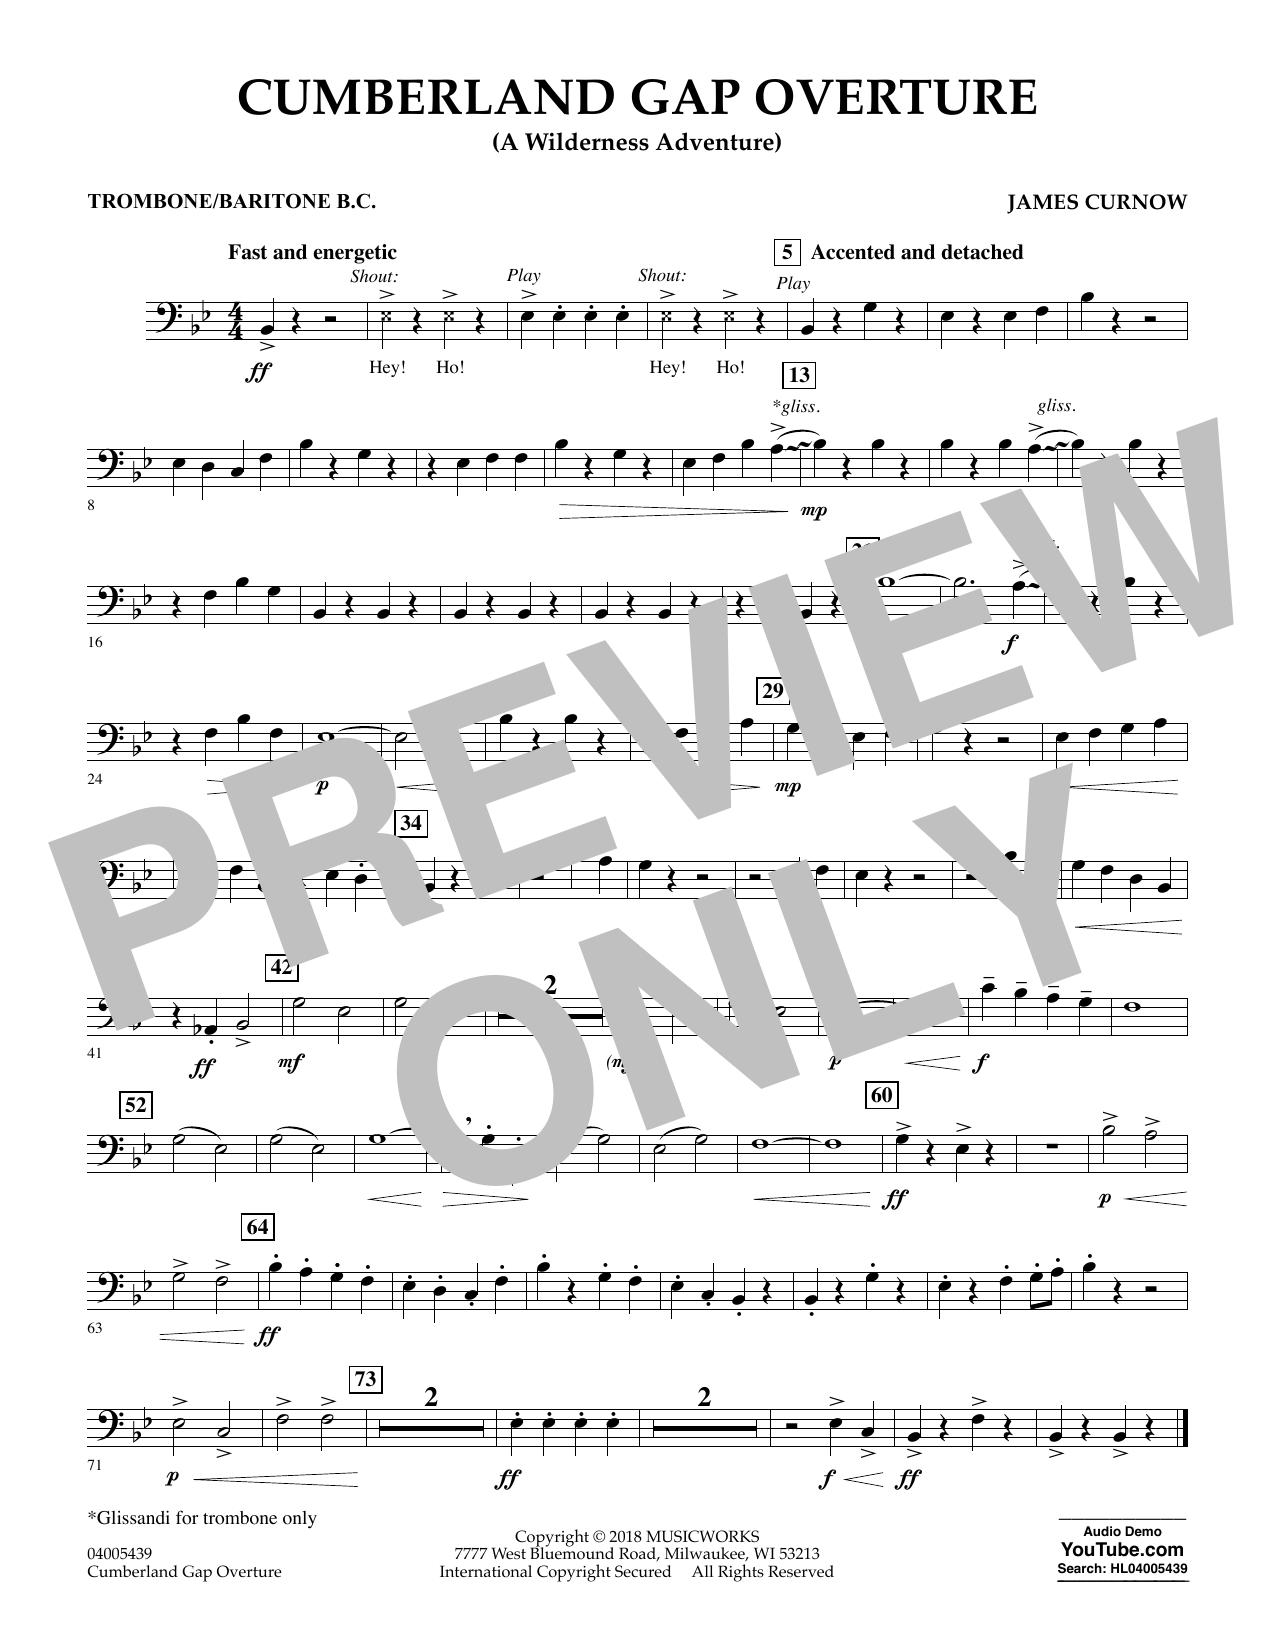 Cumberland Gap Overture (A Wilderness Adventure) - Trombone/Baritone B.C. (Concert Band)